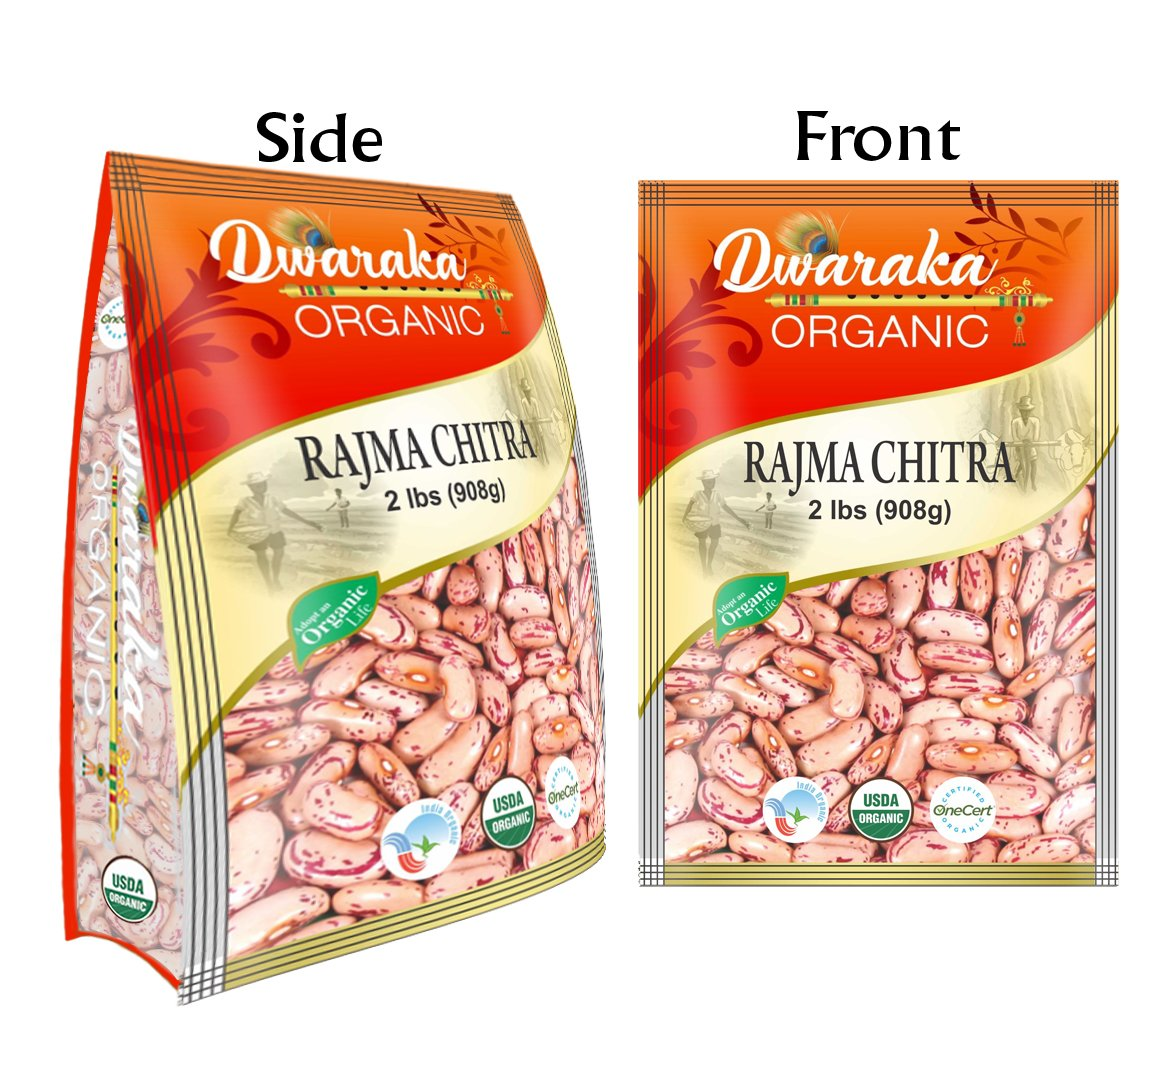 Dwaraka Organic Speckled Kidney Beans Chitra Rajma - USDA Organic (2 lbs / 908 g)